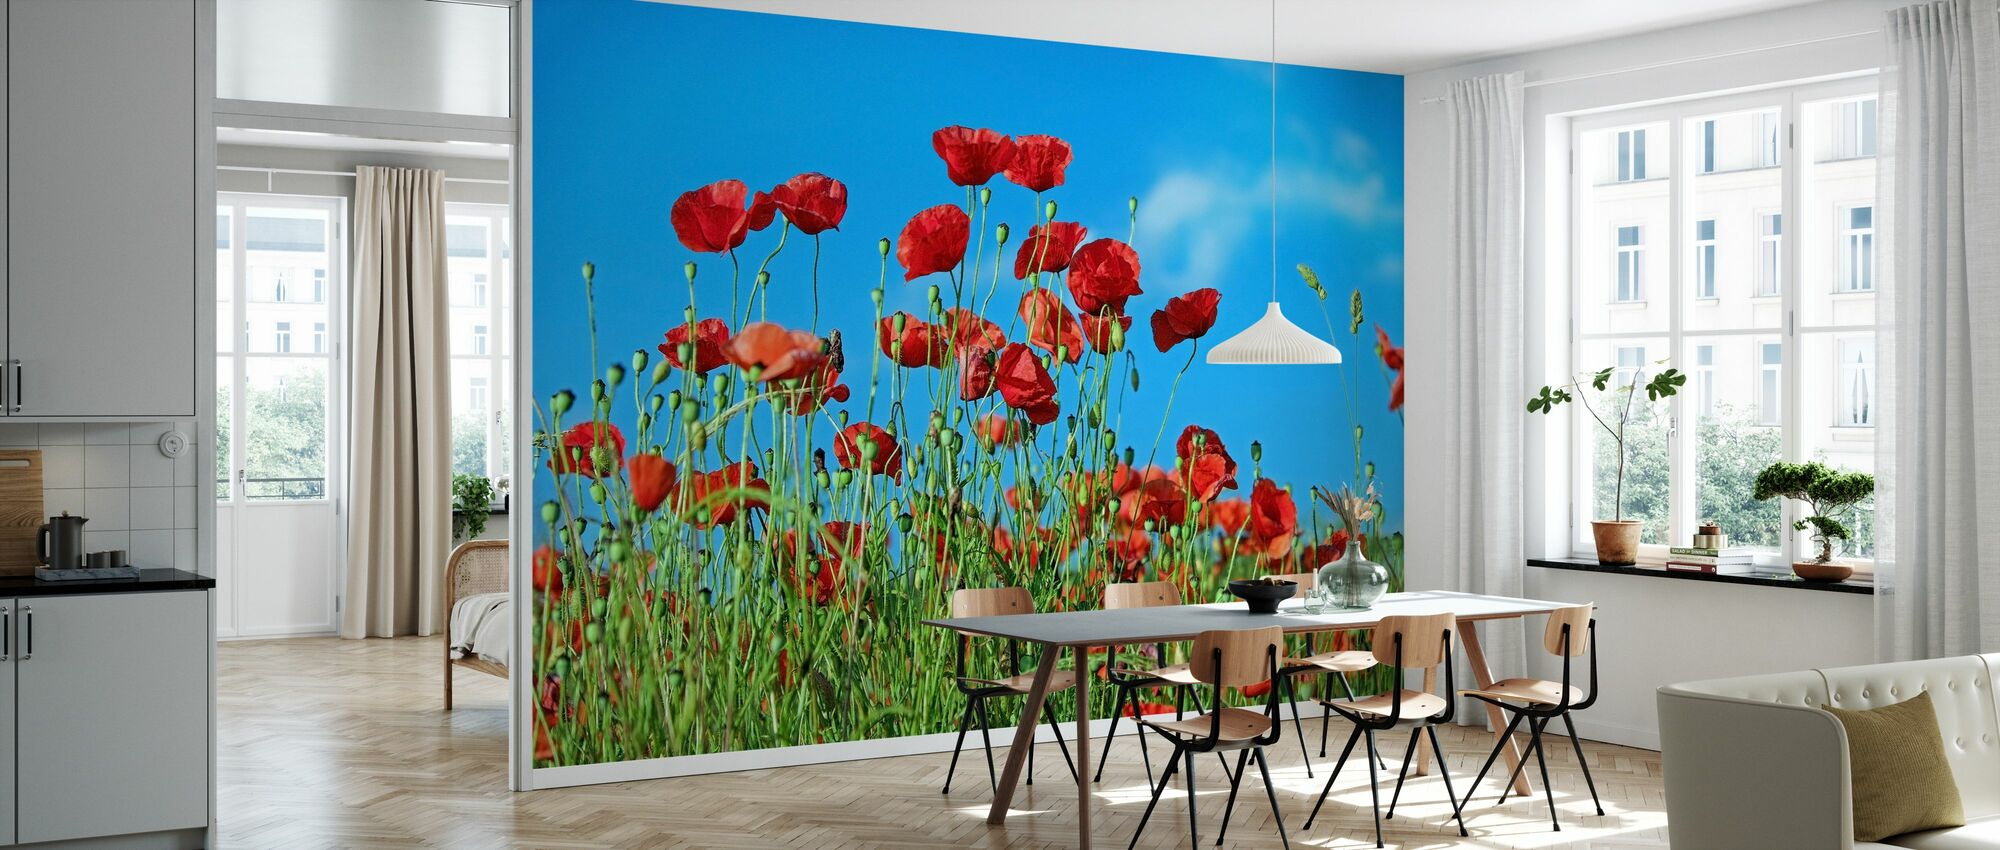 Field of Poppies - Wallpaper - Kitchen